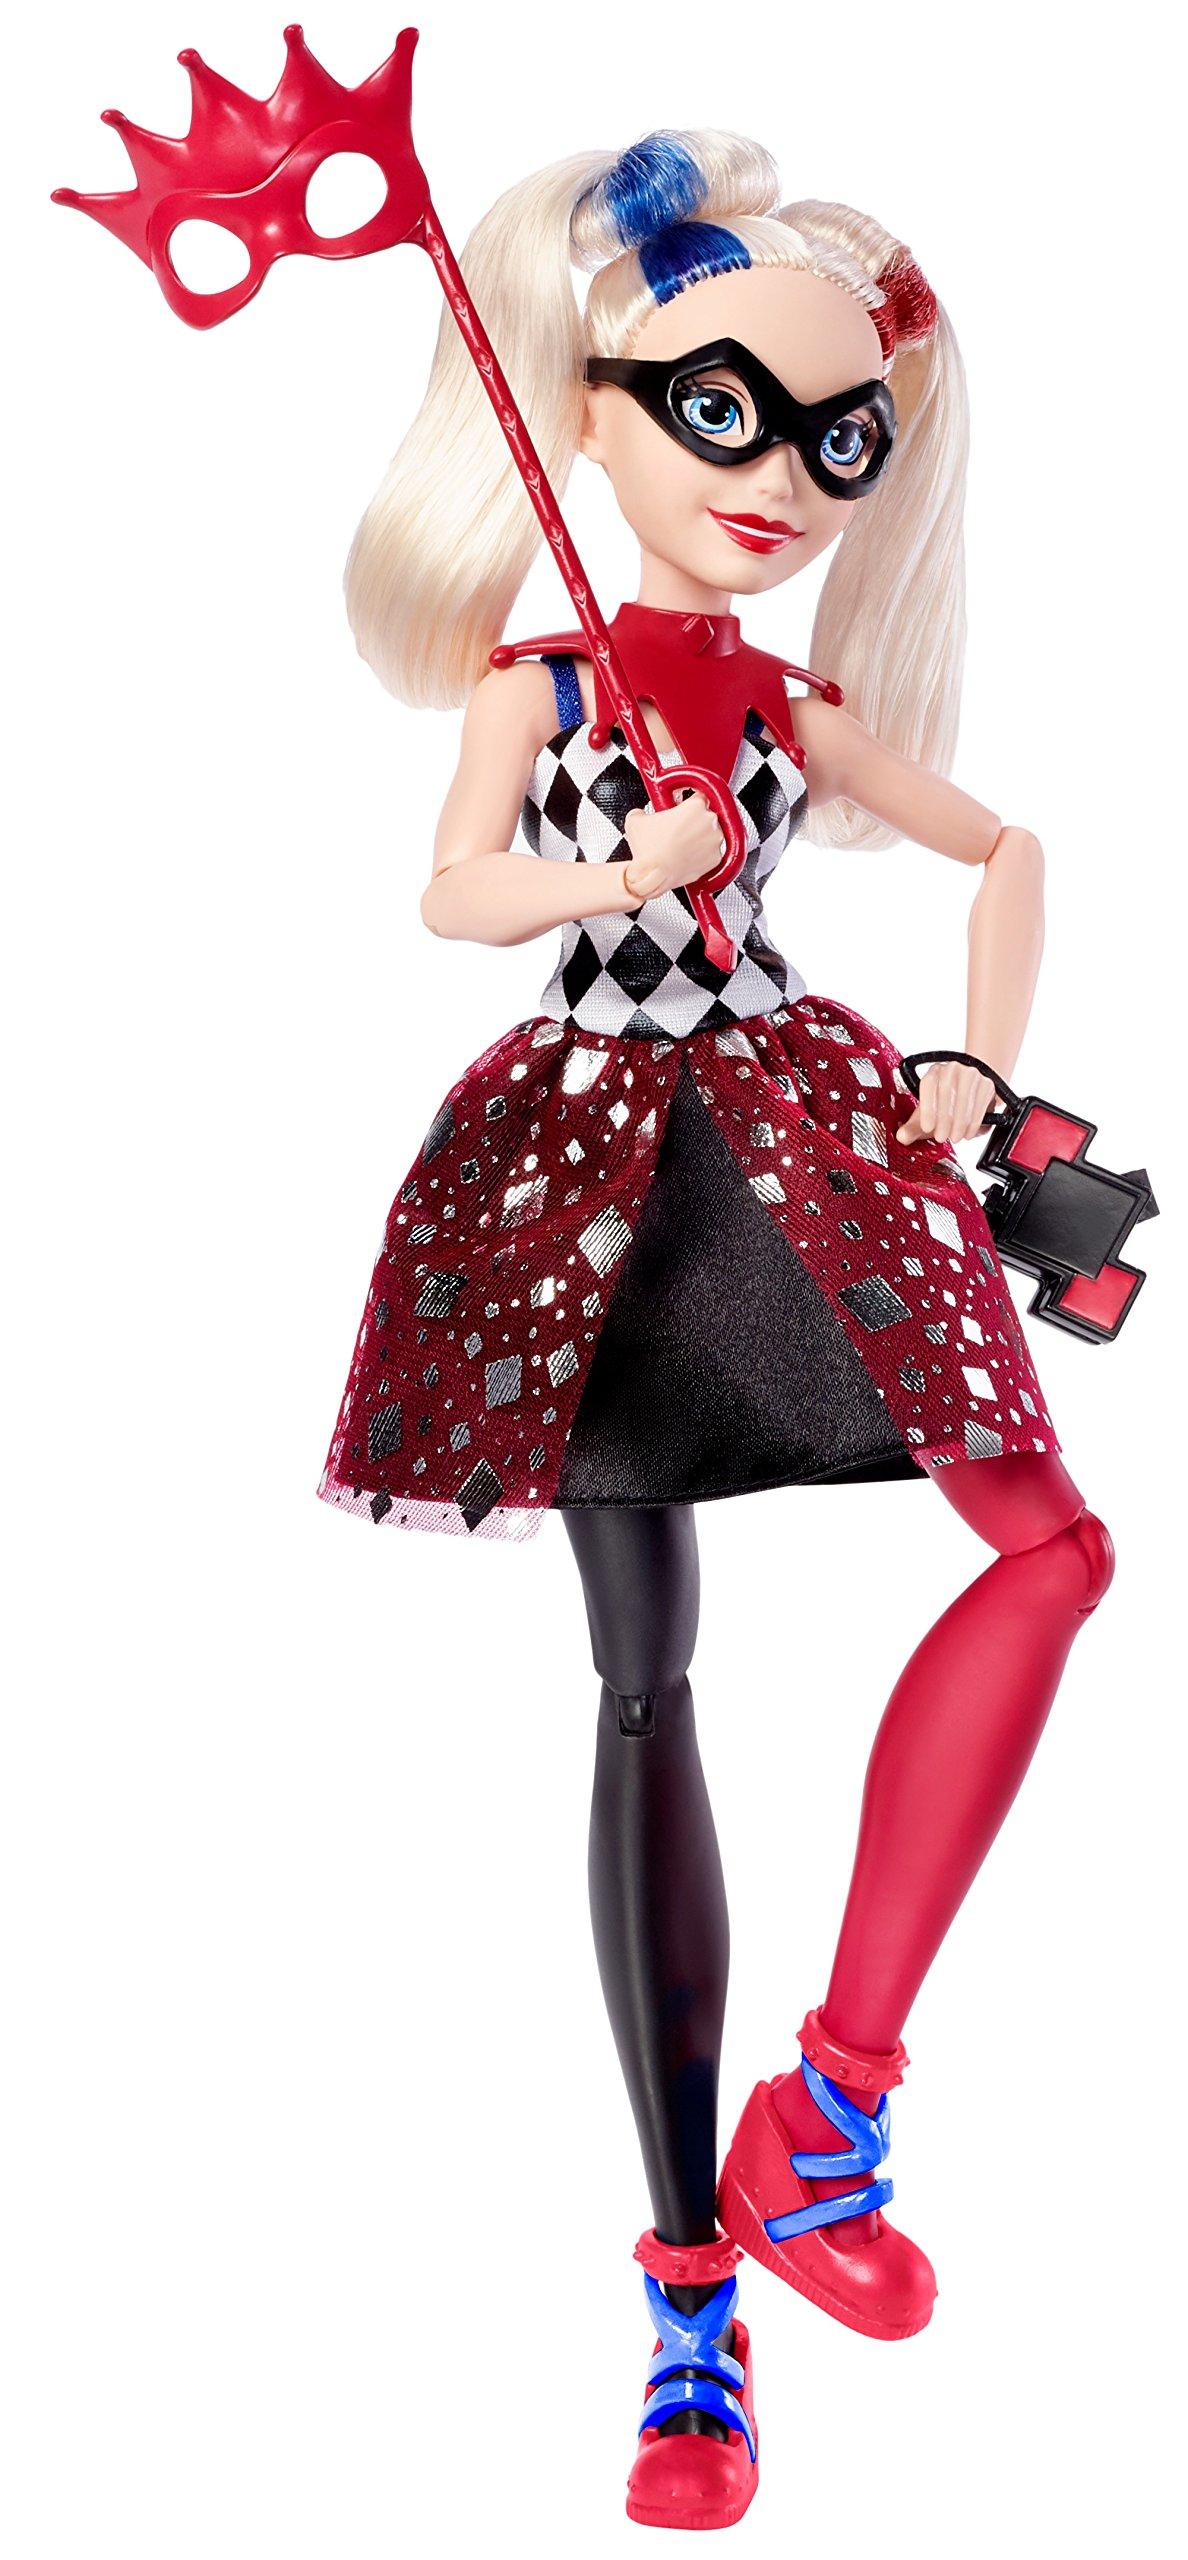 DC Super Hero Girls Harley Quinn Masquerade Doll